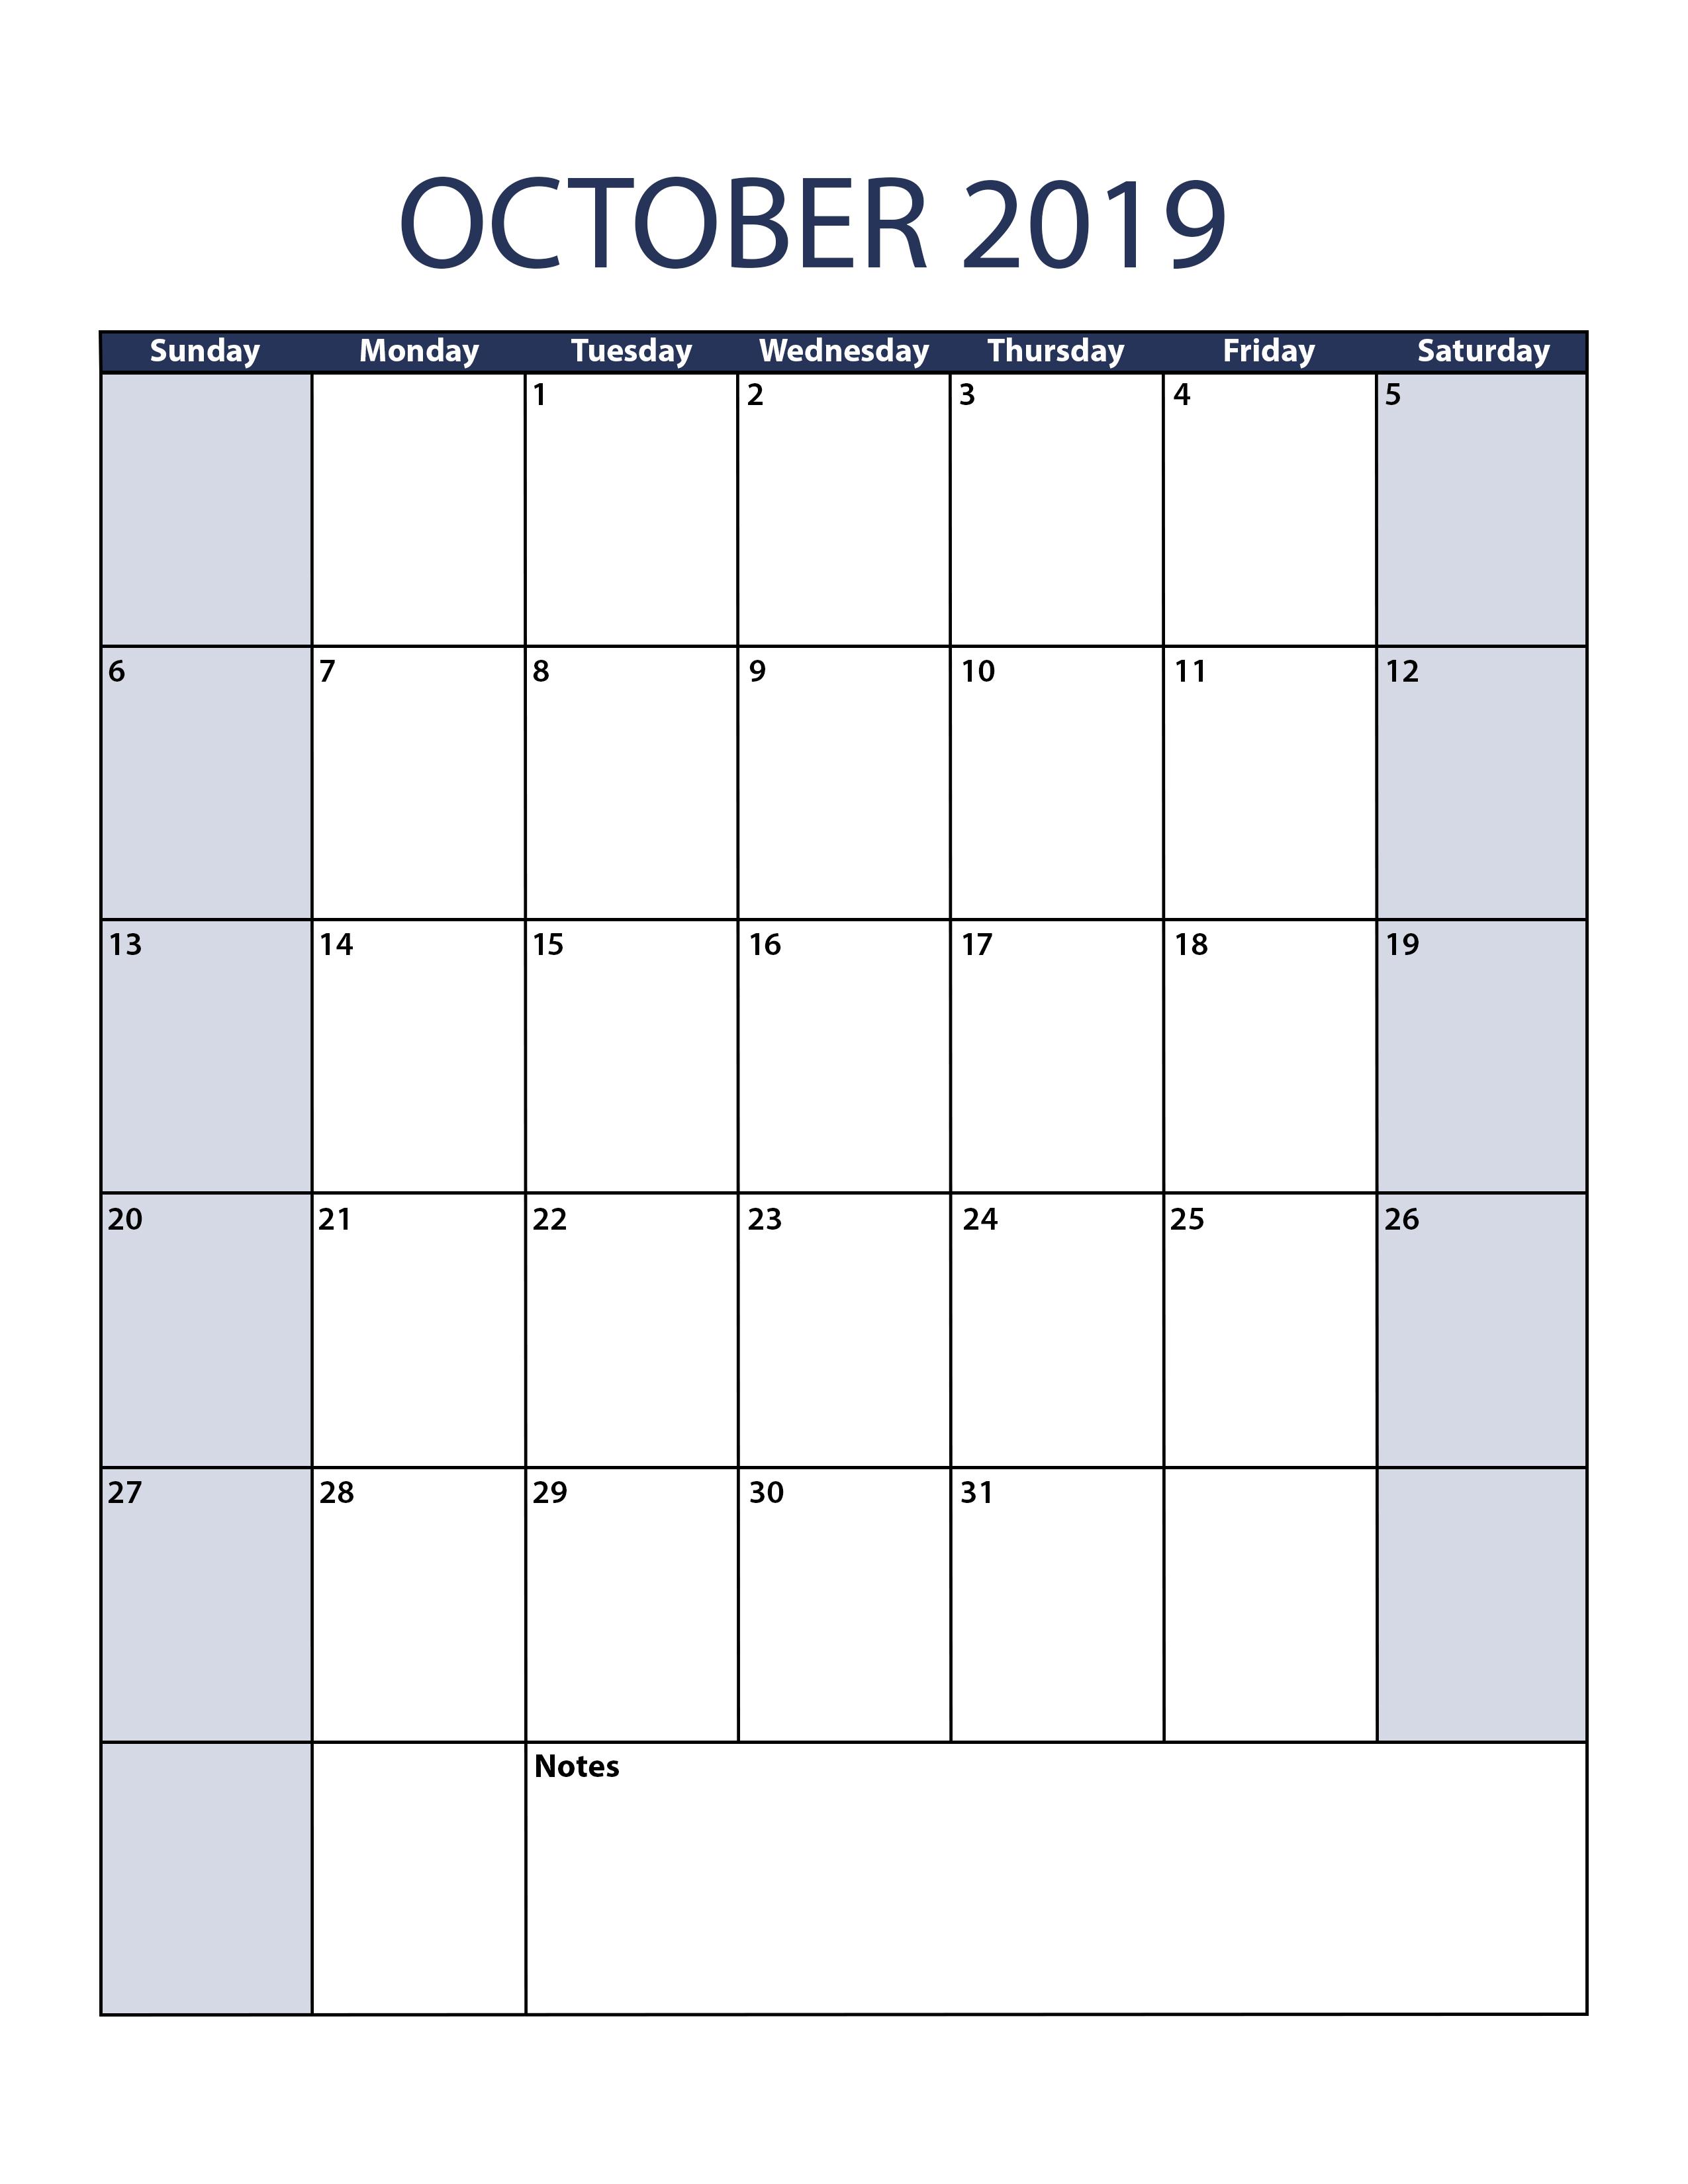 Blank October 2019 Calendar To Print regarding Catholic Calander For October 2019